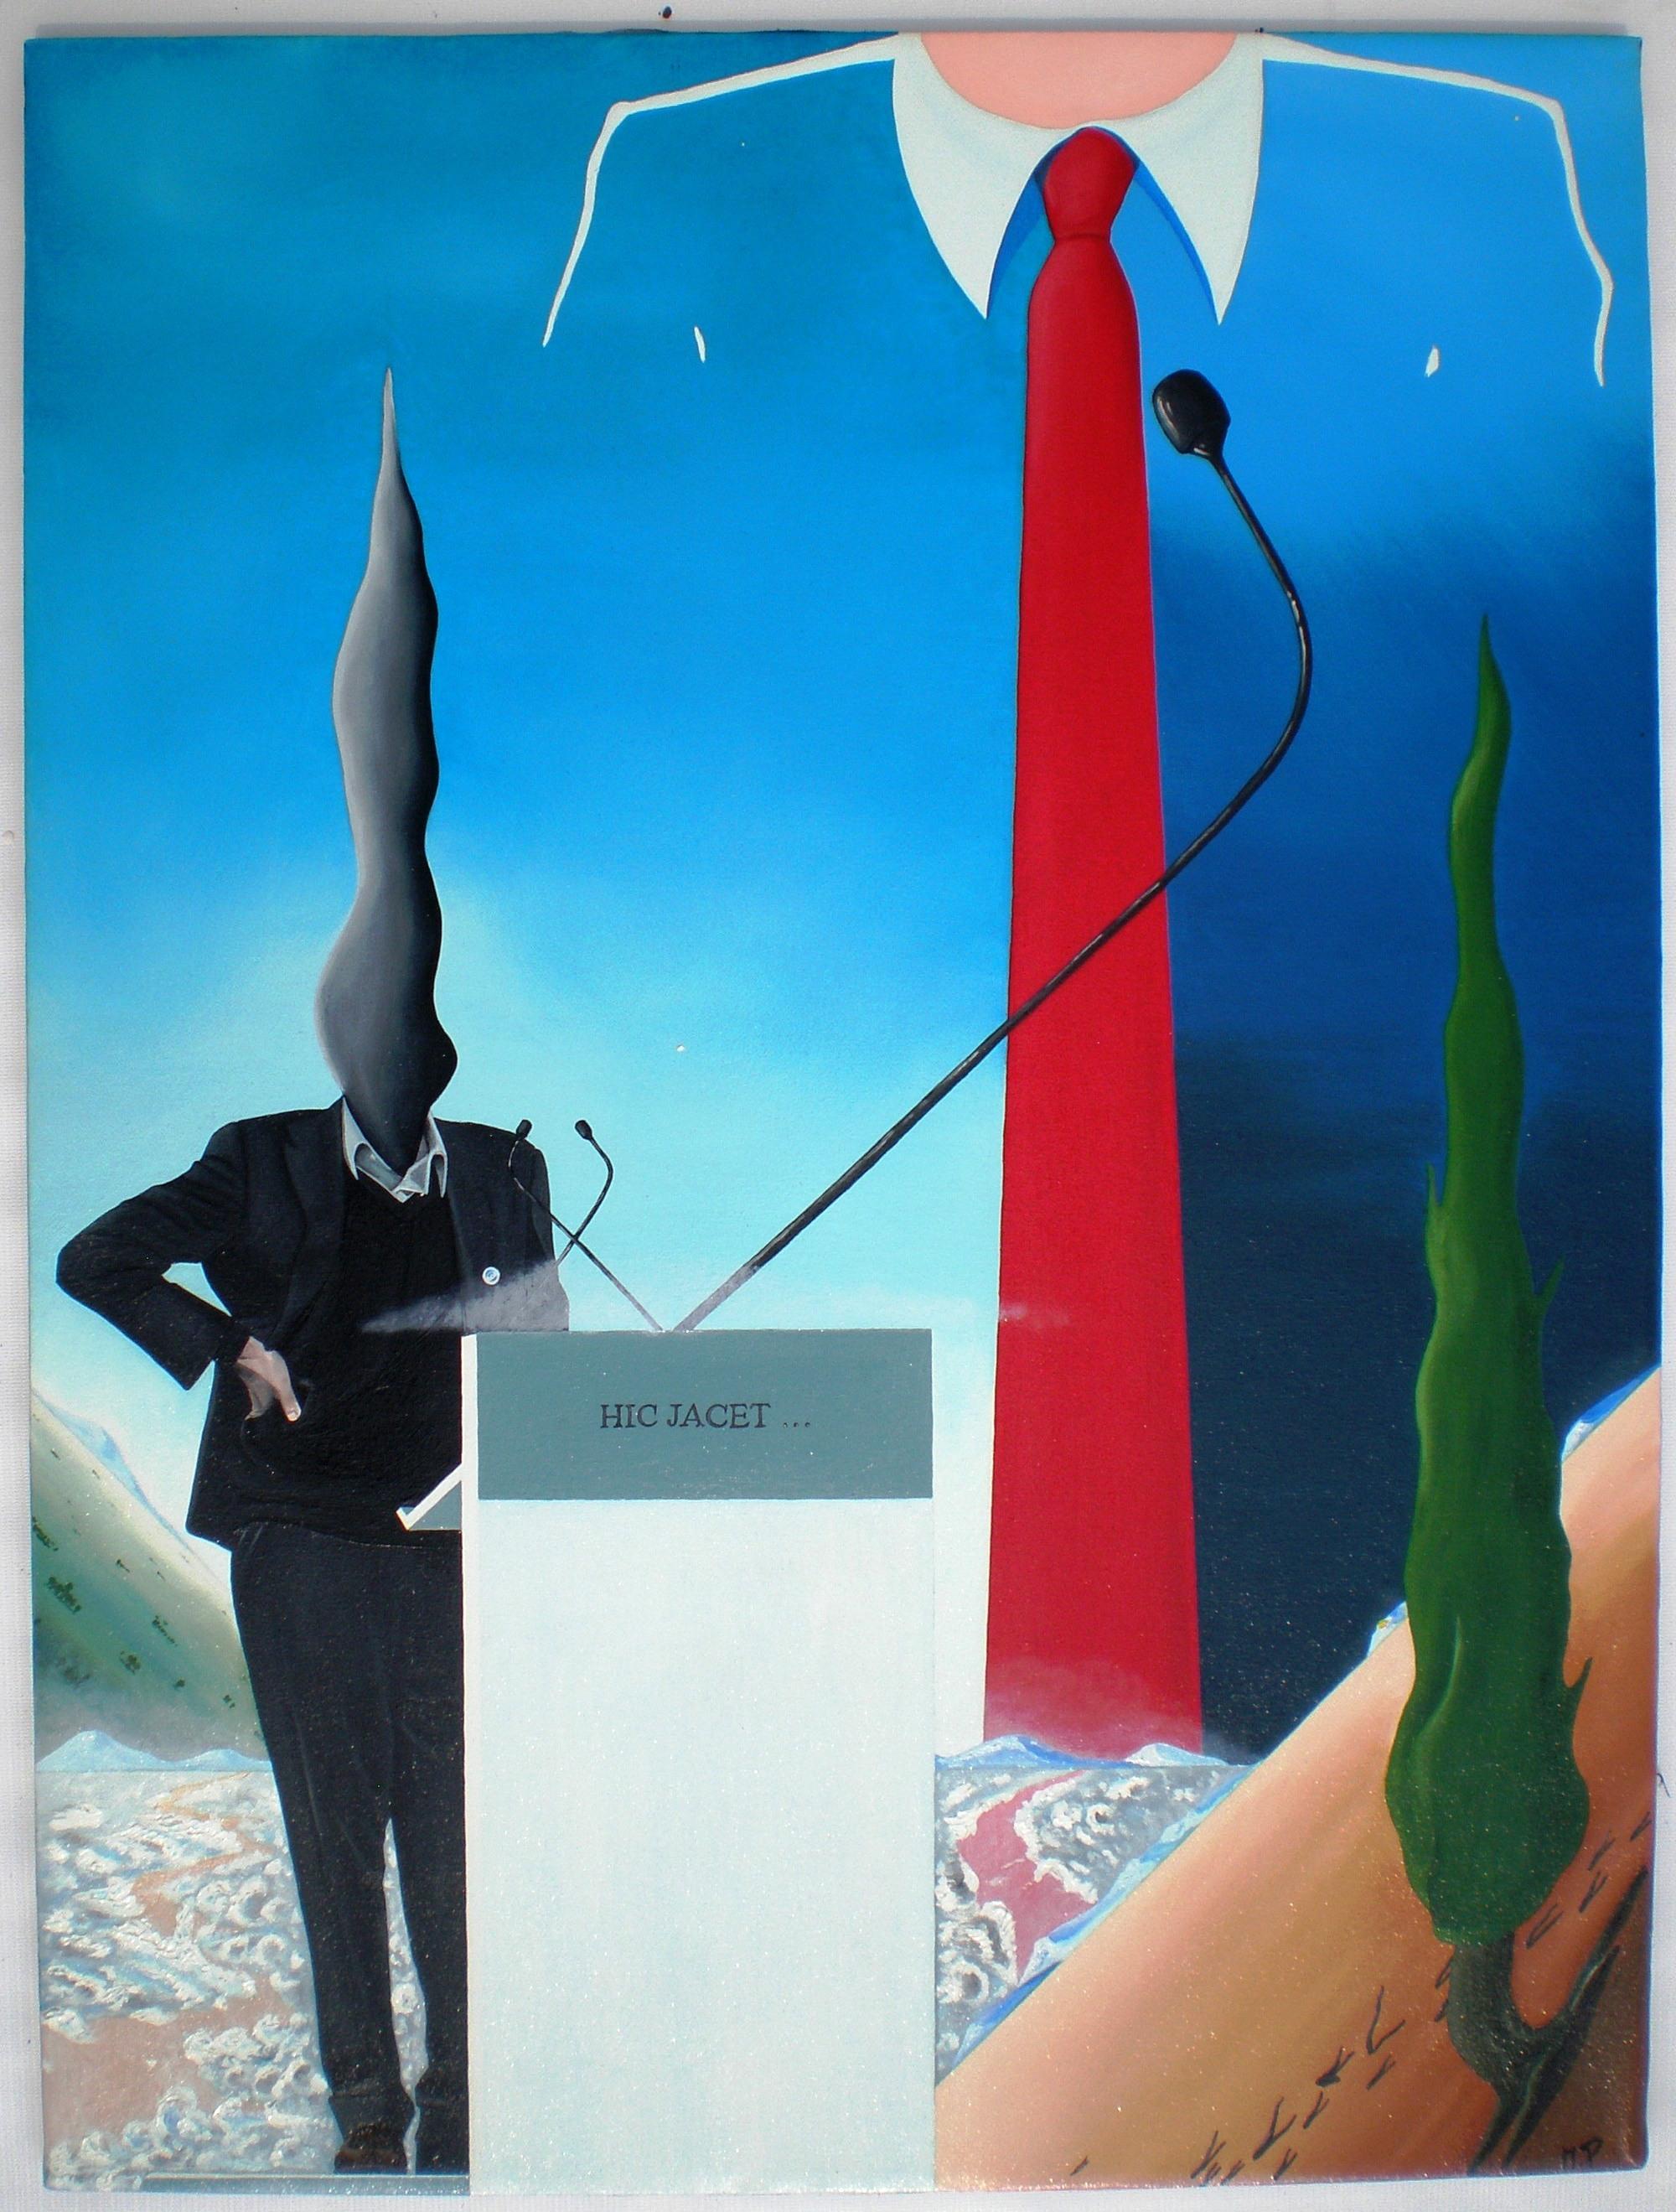 Convention, 2012, olio su tela, cm 80x60, Pasquale Mastrogiacomo, Acerno (SA)